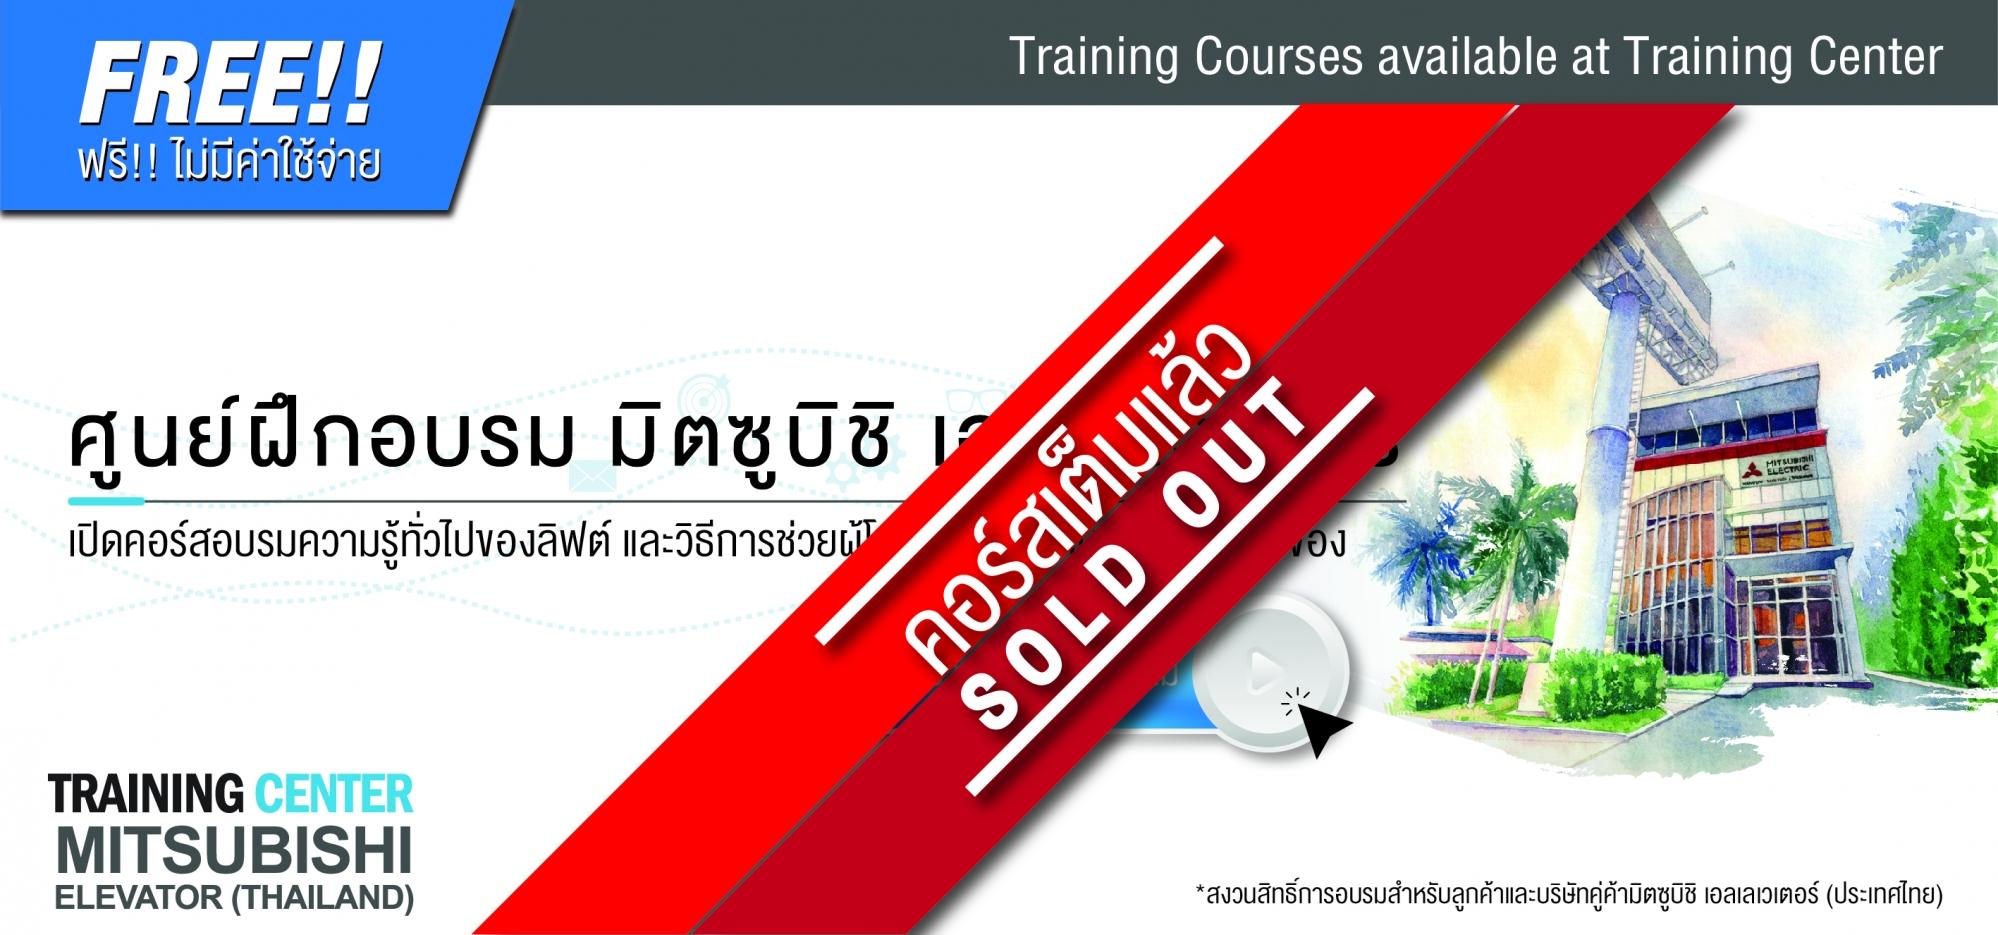 Training Application Form ลงทะเบียนคอร์สอบรม